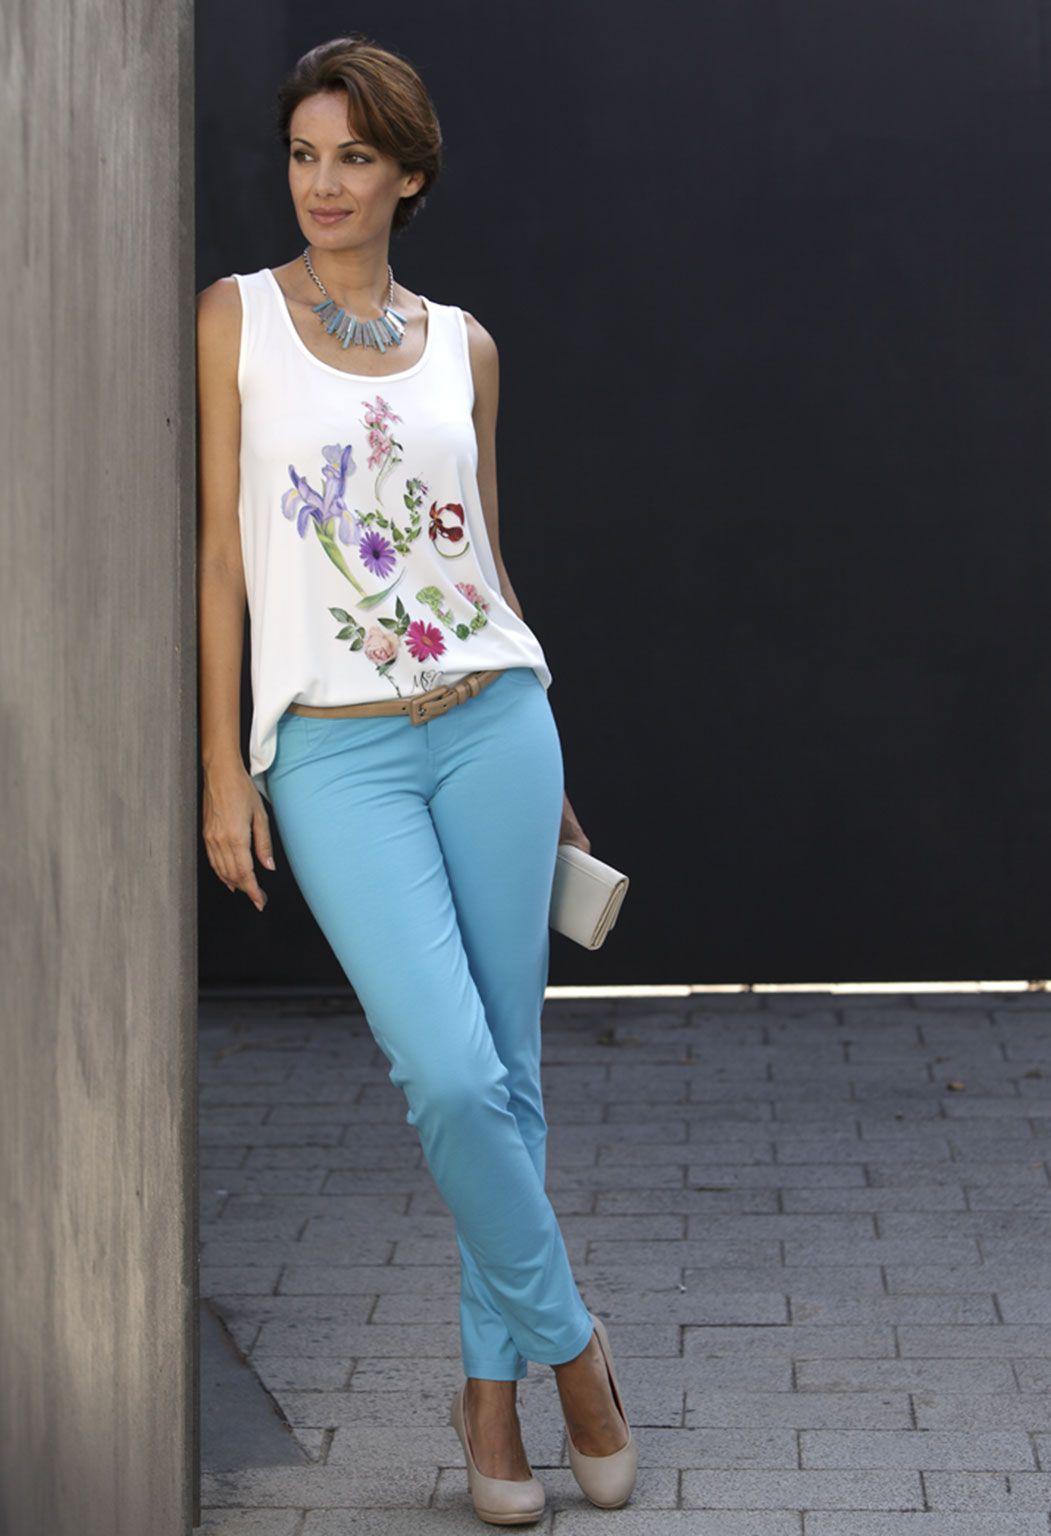 uk availability cd1fd ca457 Camiseta tirantes blanca con estampado floral + pantalon recto azul claro   Mujer  Massana  Spring  Summer  MassanaOutwear